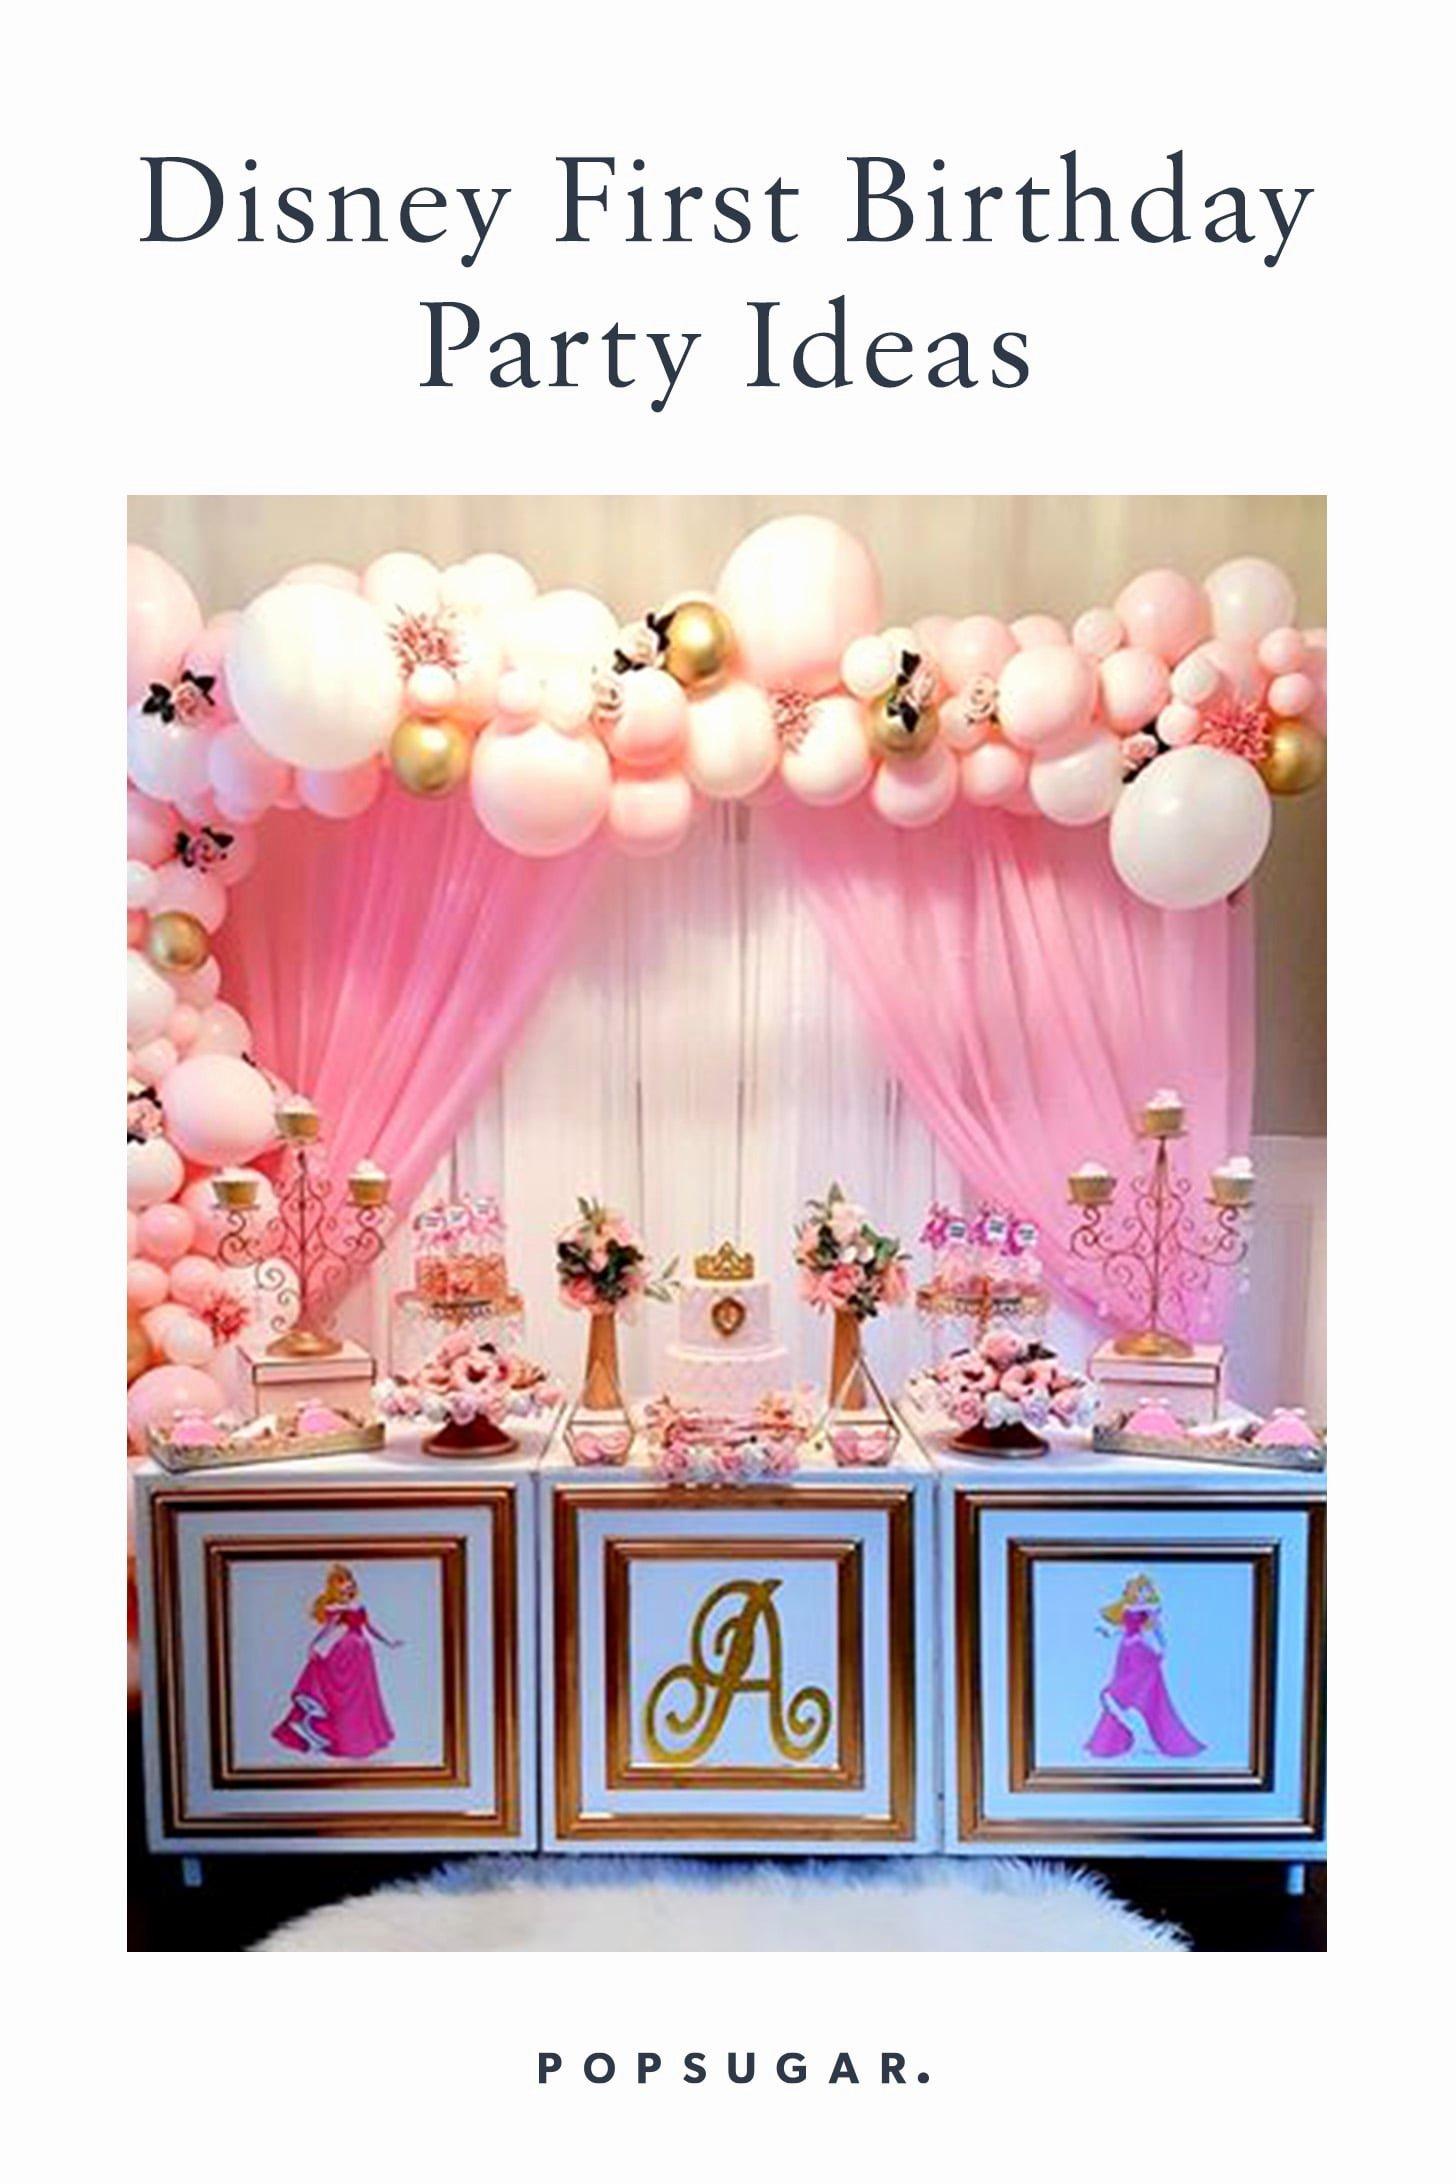 Disney Birthday Decoration Ideas Lovely Disney First Birthday Party Ideas